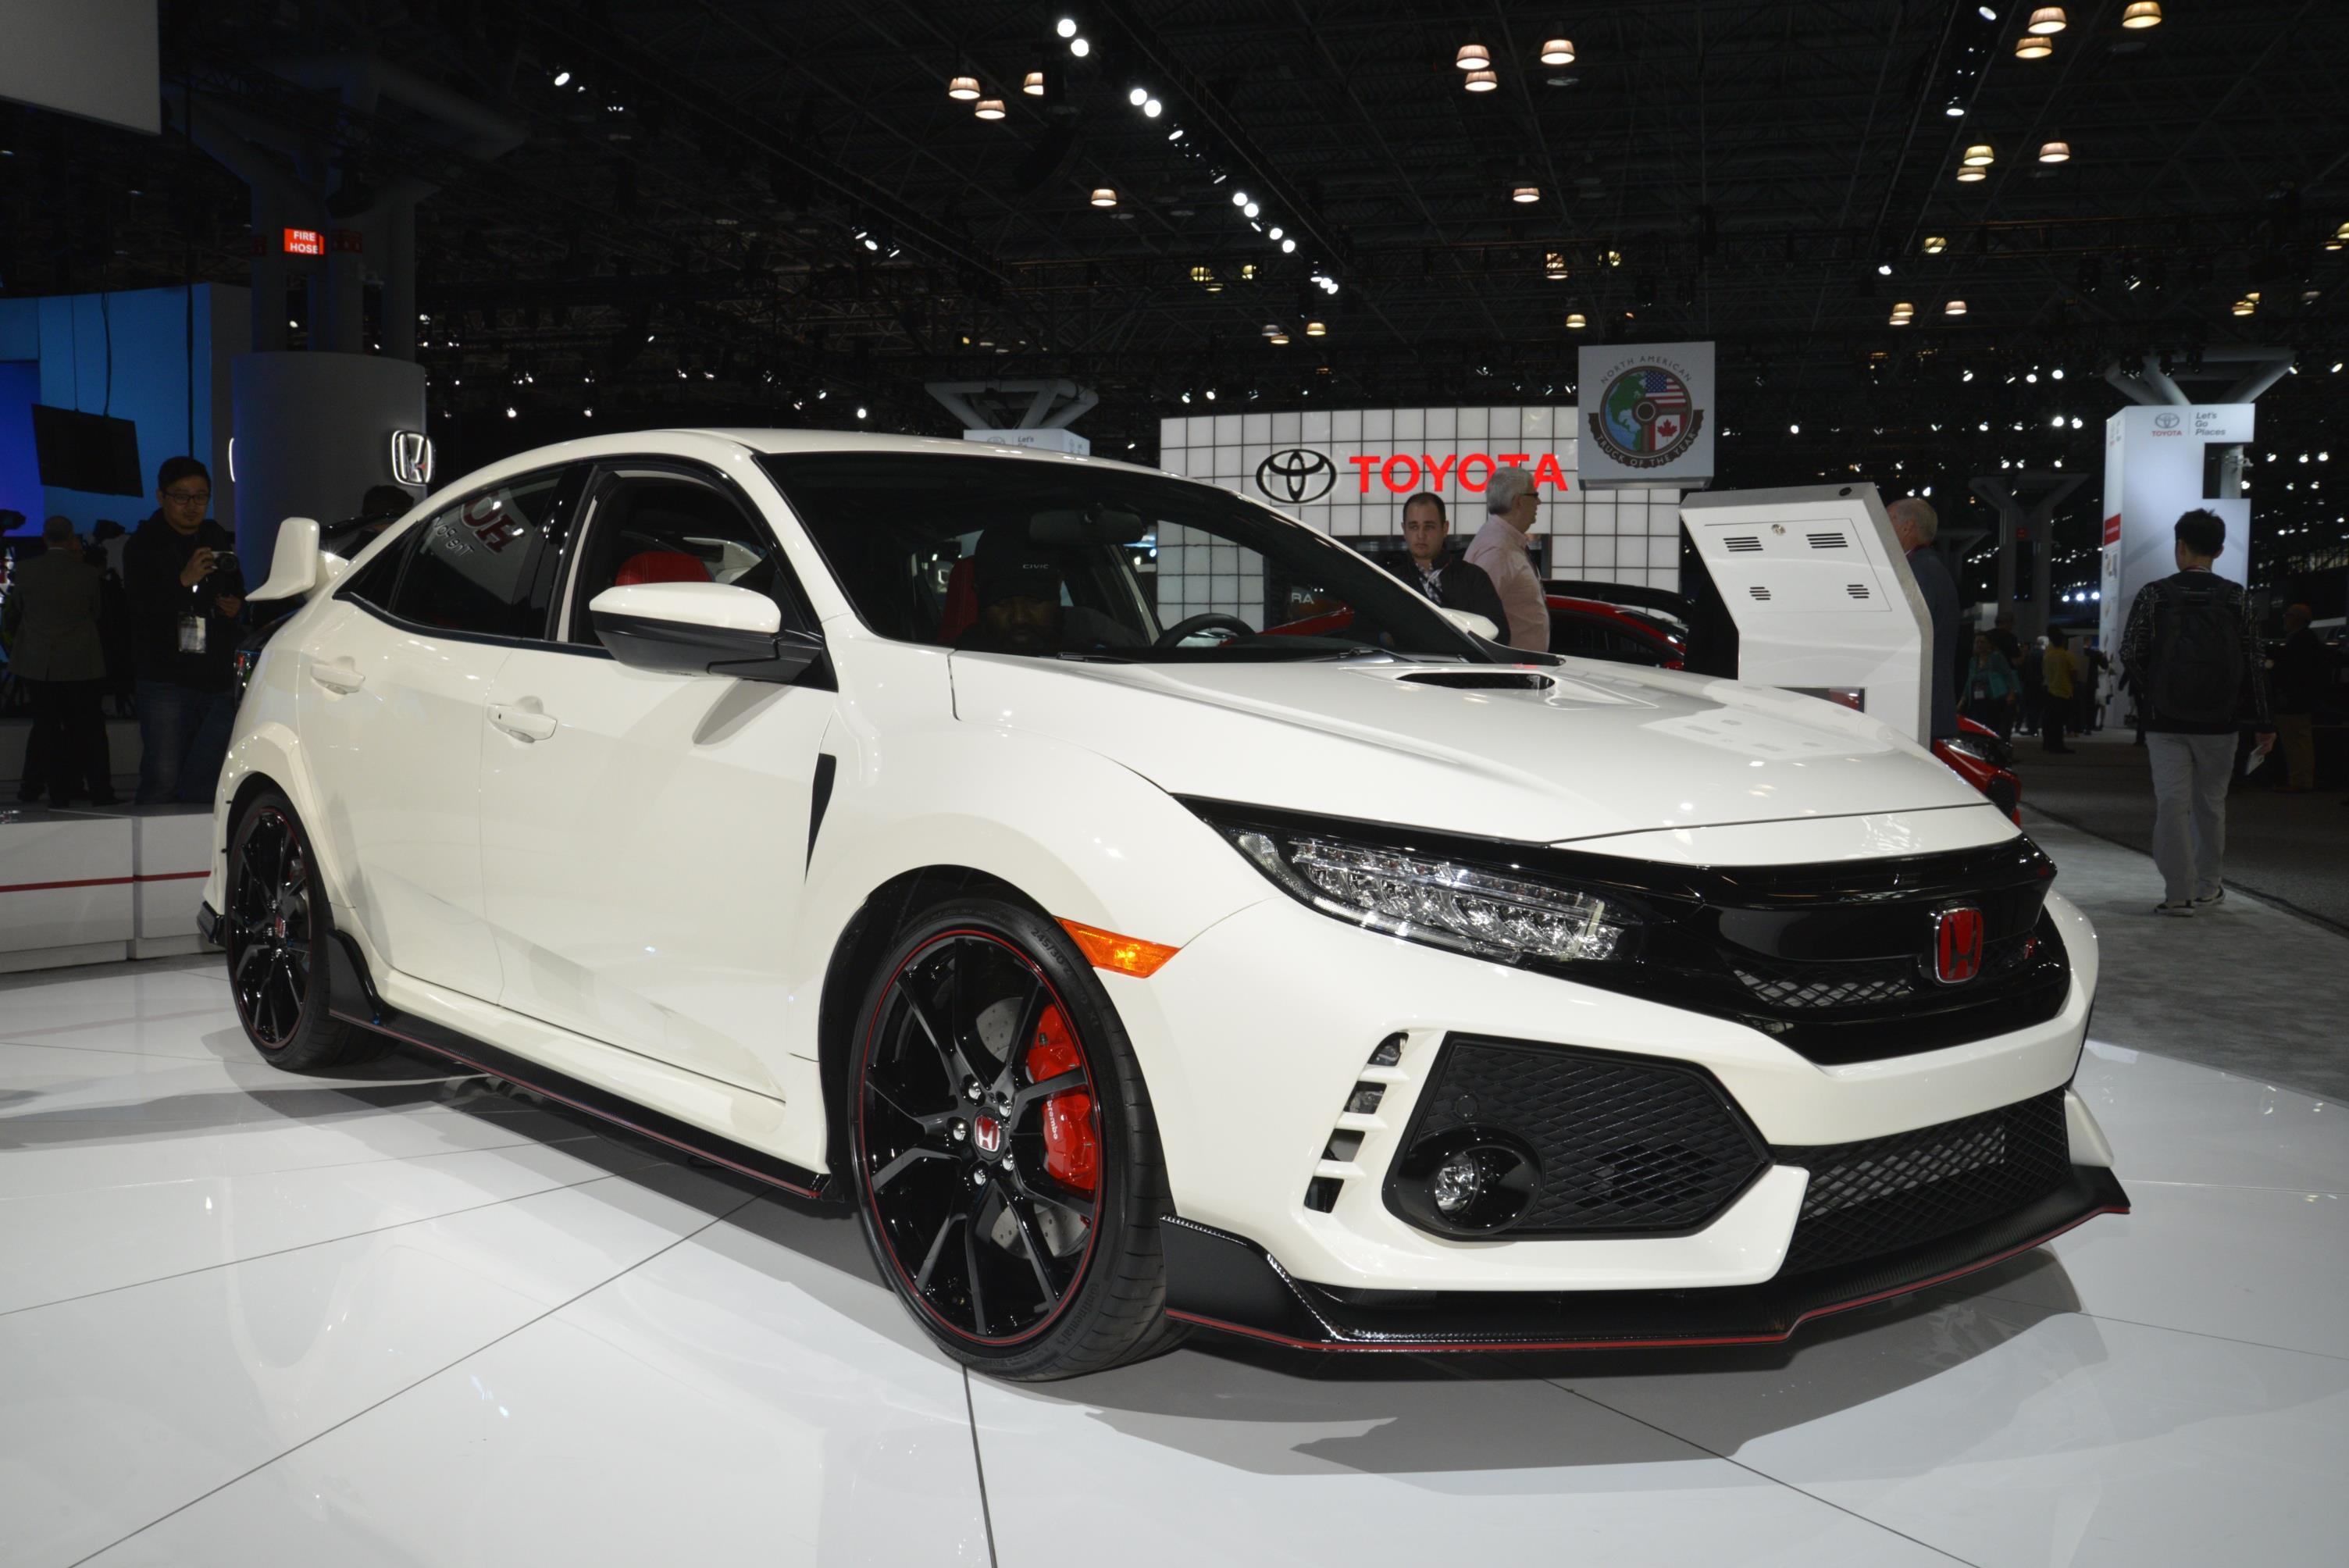 New York Auto Show 2017 (81)